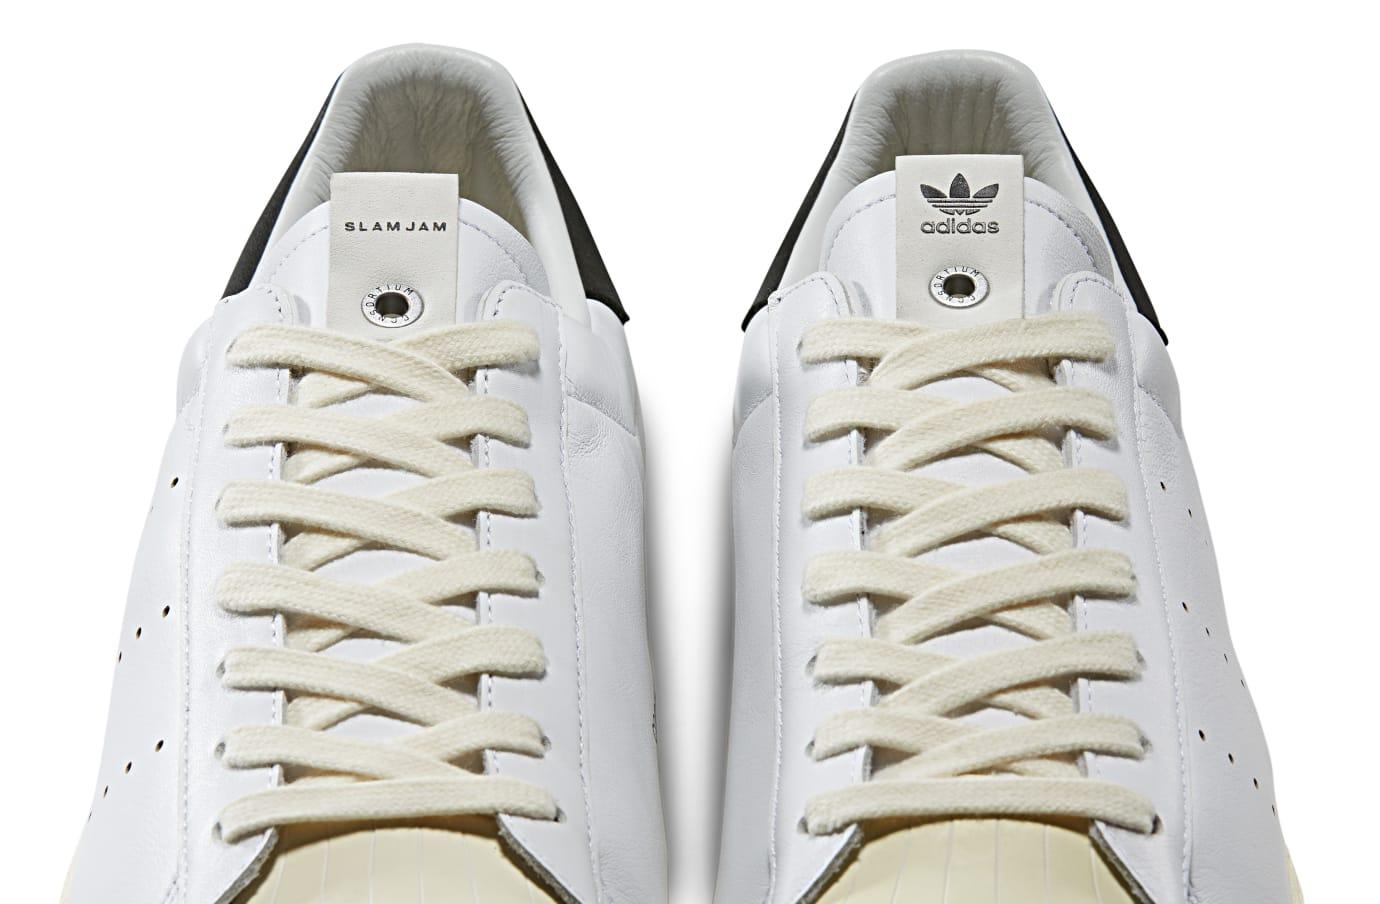 Slam Jam x Adidas 80s Superstar (Tongue)